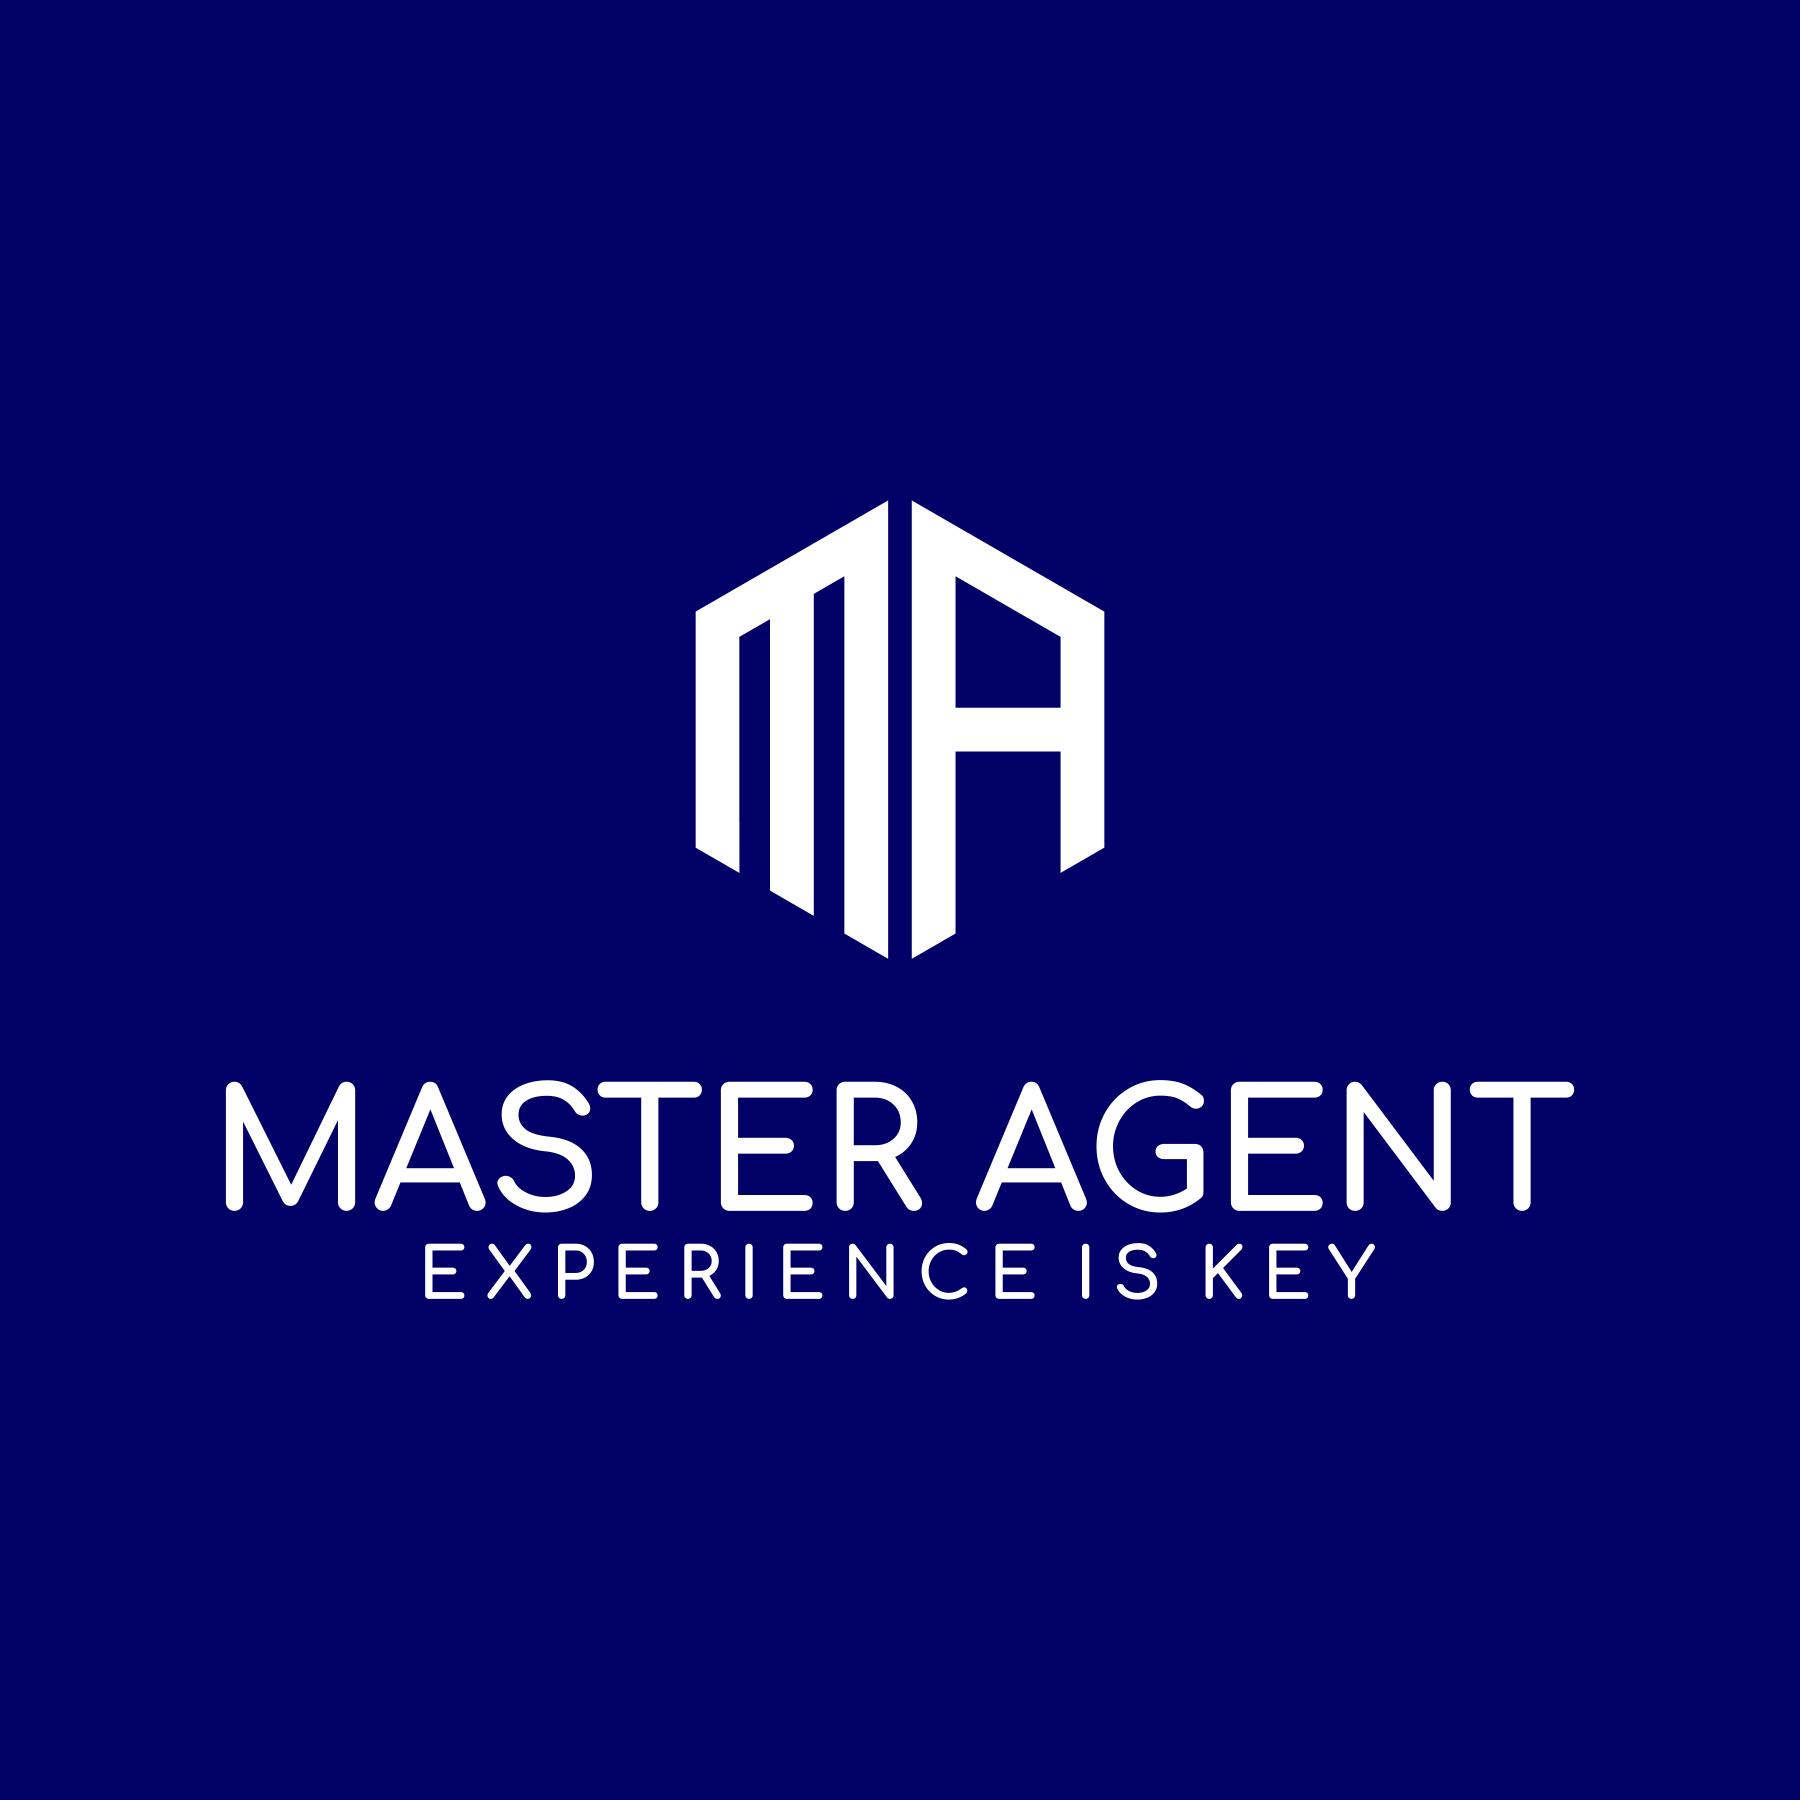 Master Agent